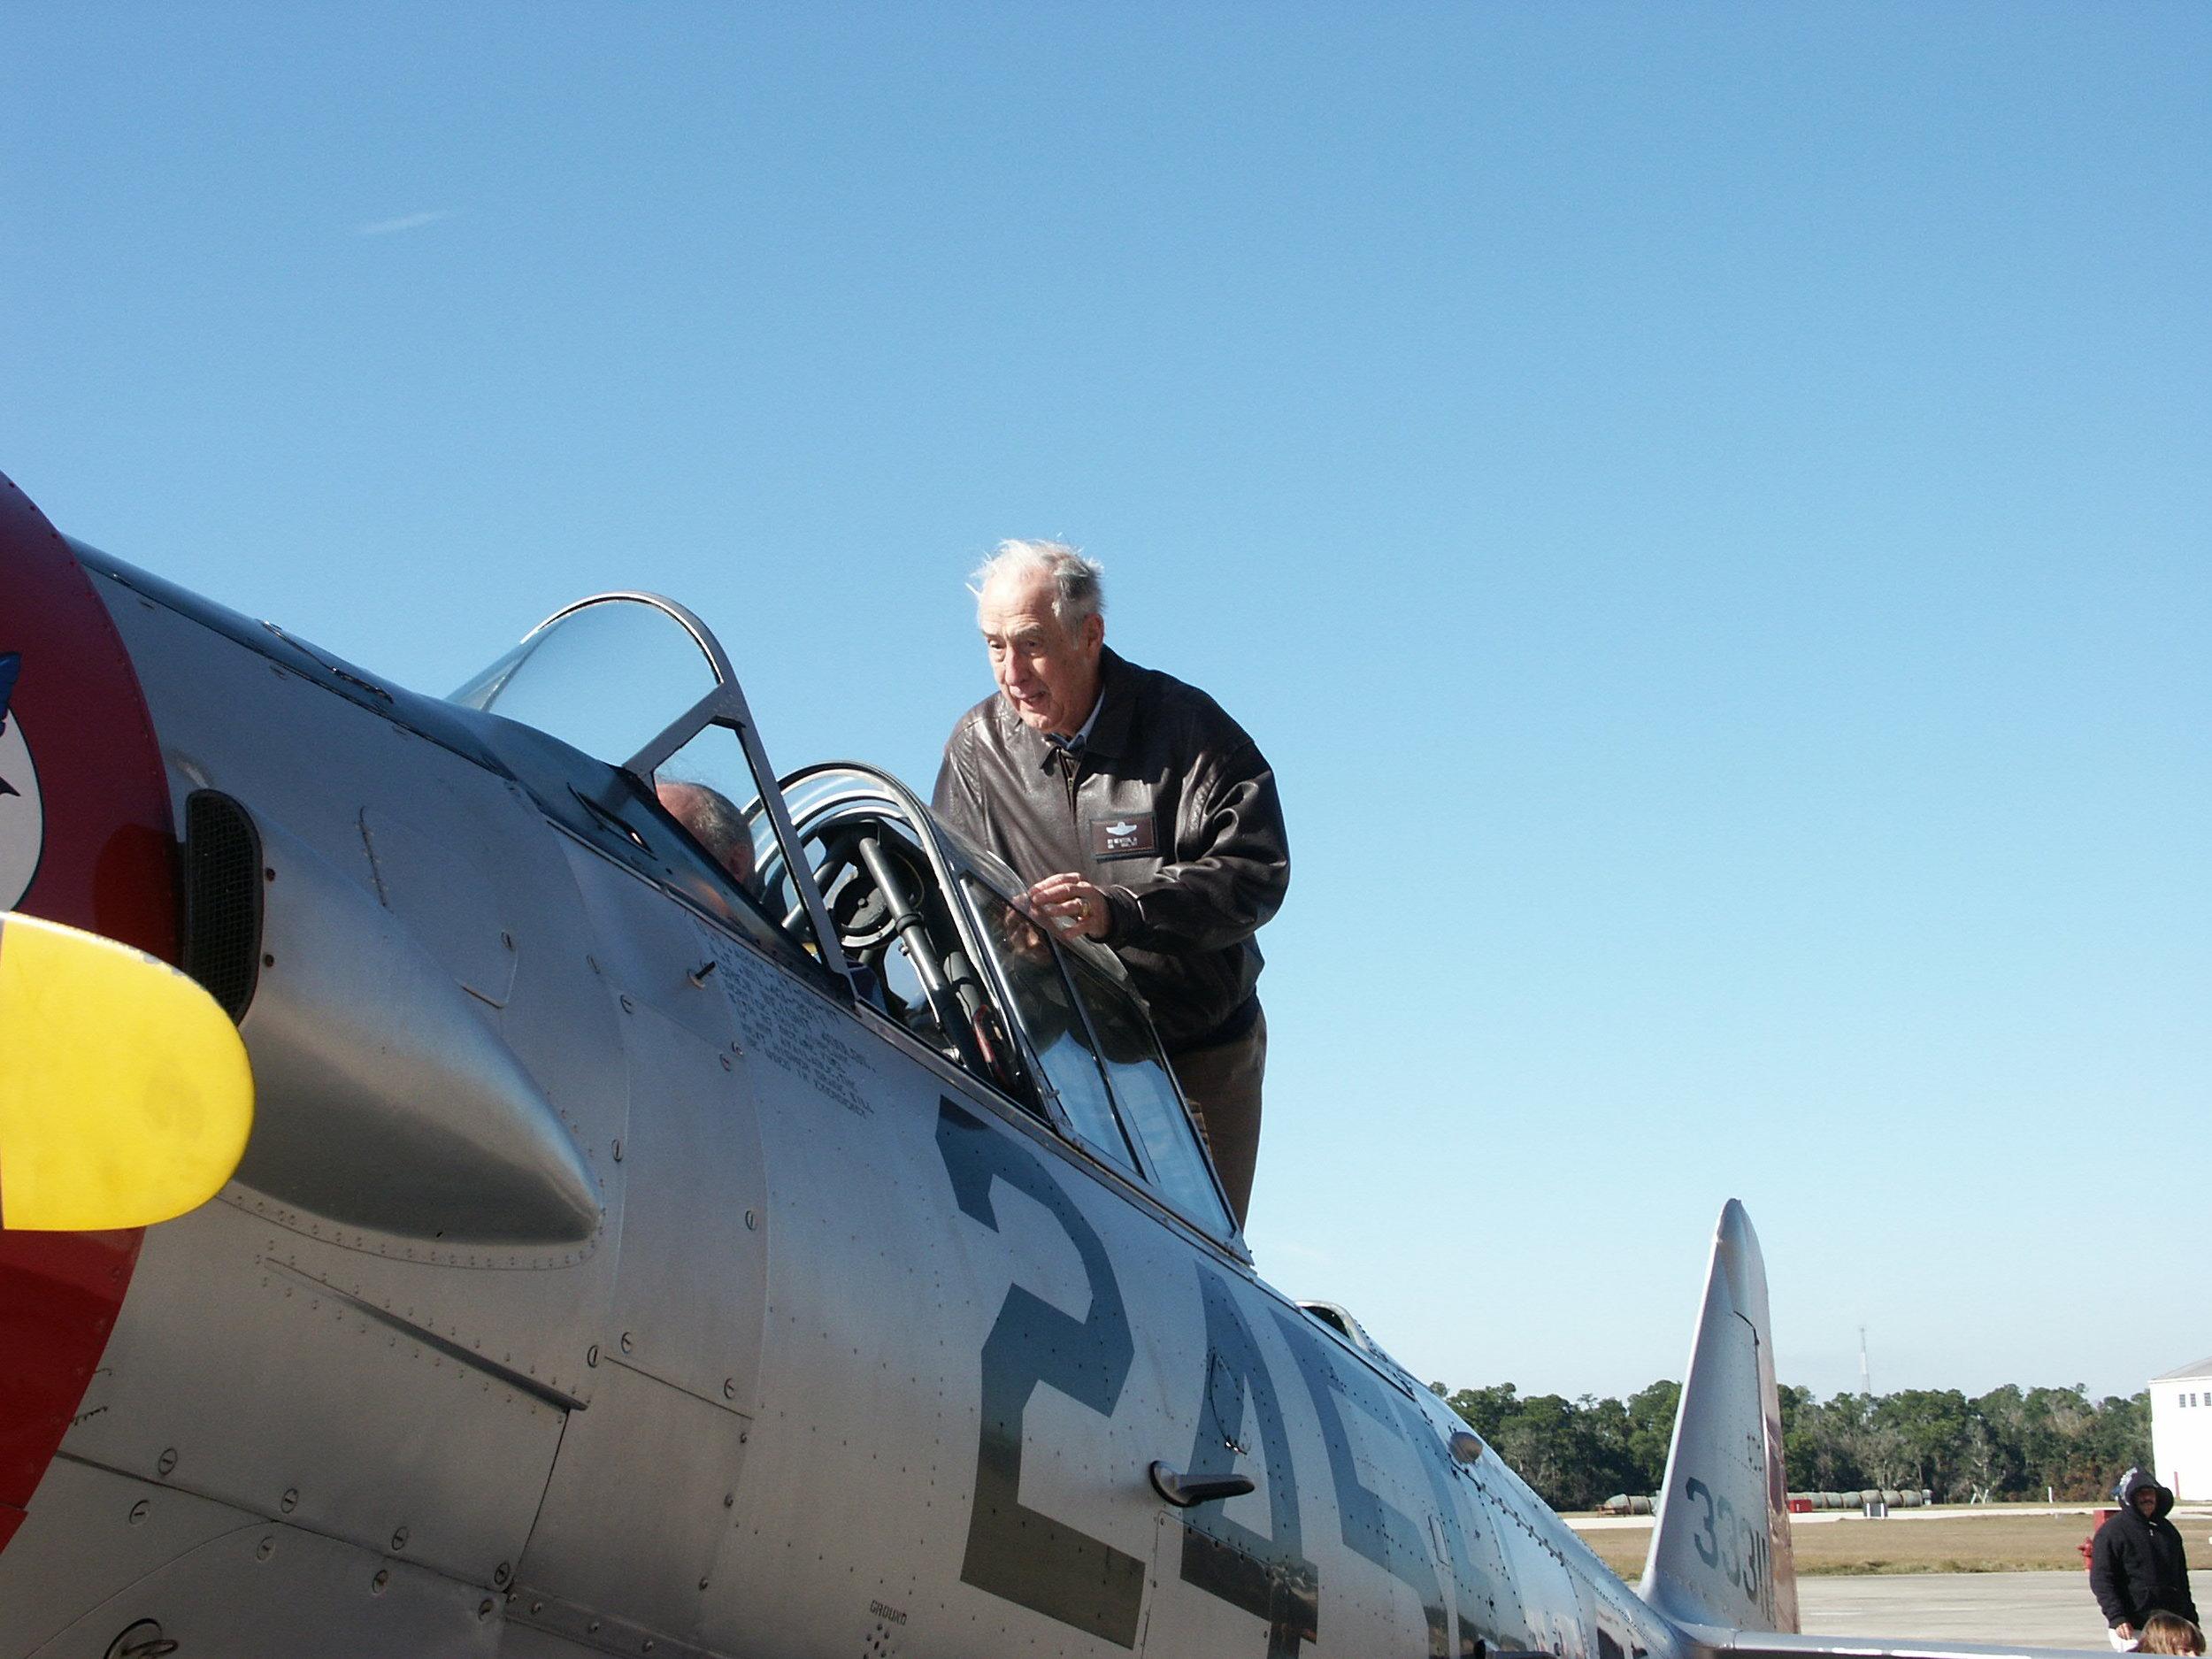 Getting in T-6 @ Fantasy of Flight, 6 Jan '10.jpg